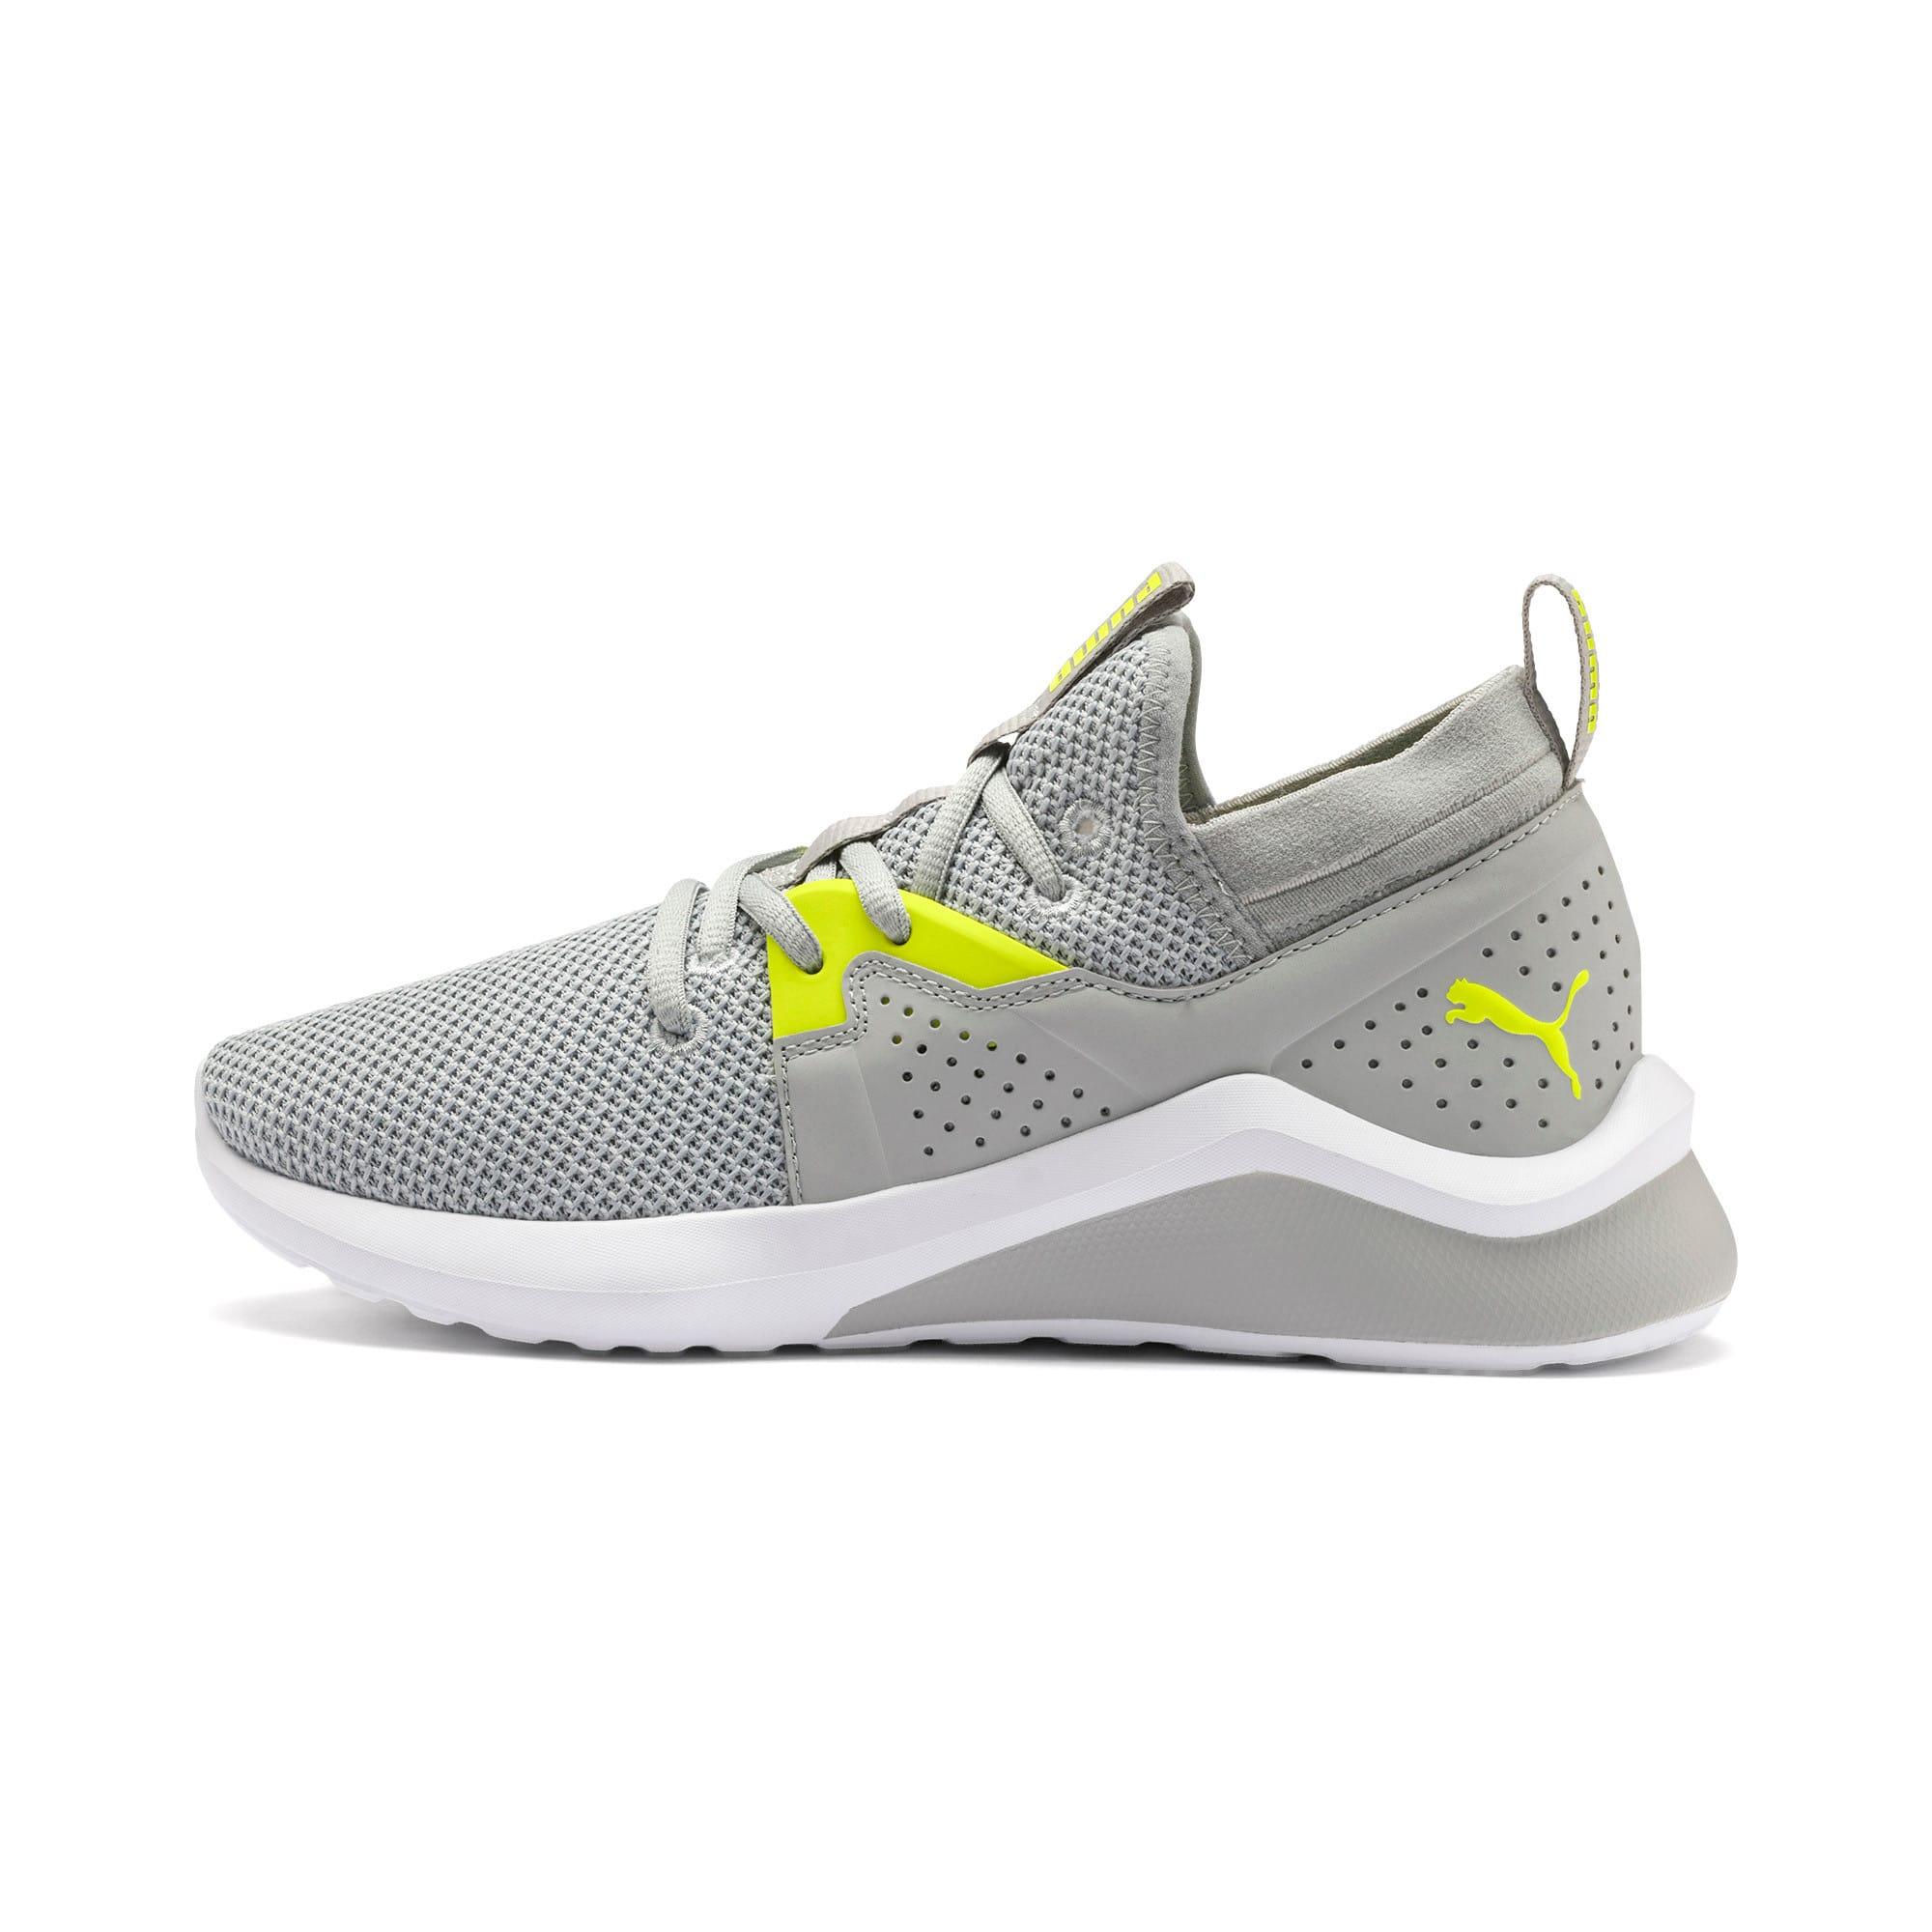 Thumbnail 1 of Emergence Sneakers JR, High Rise-Nrgy Yellow, medium